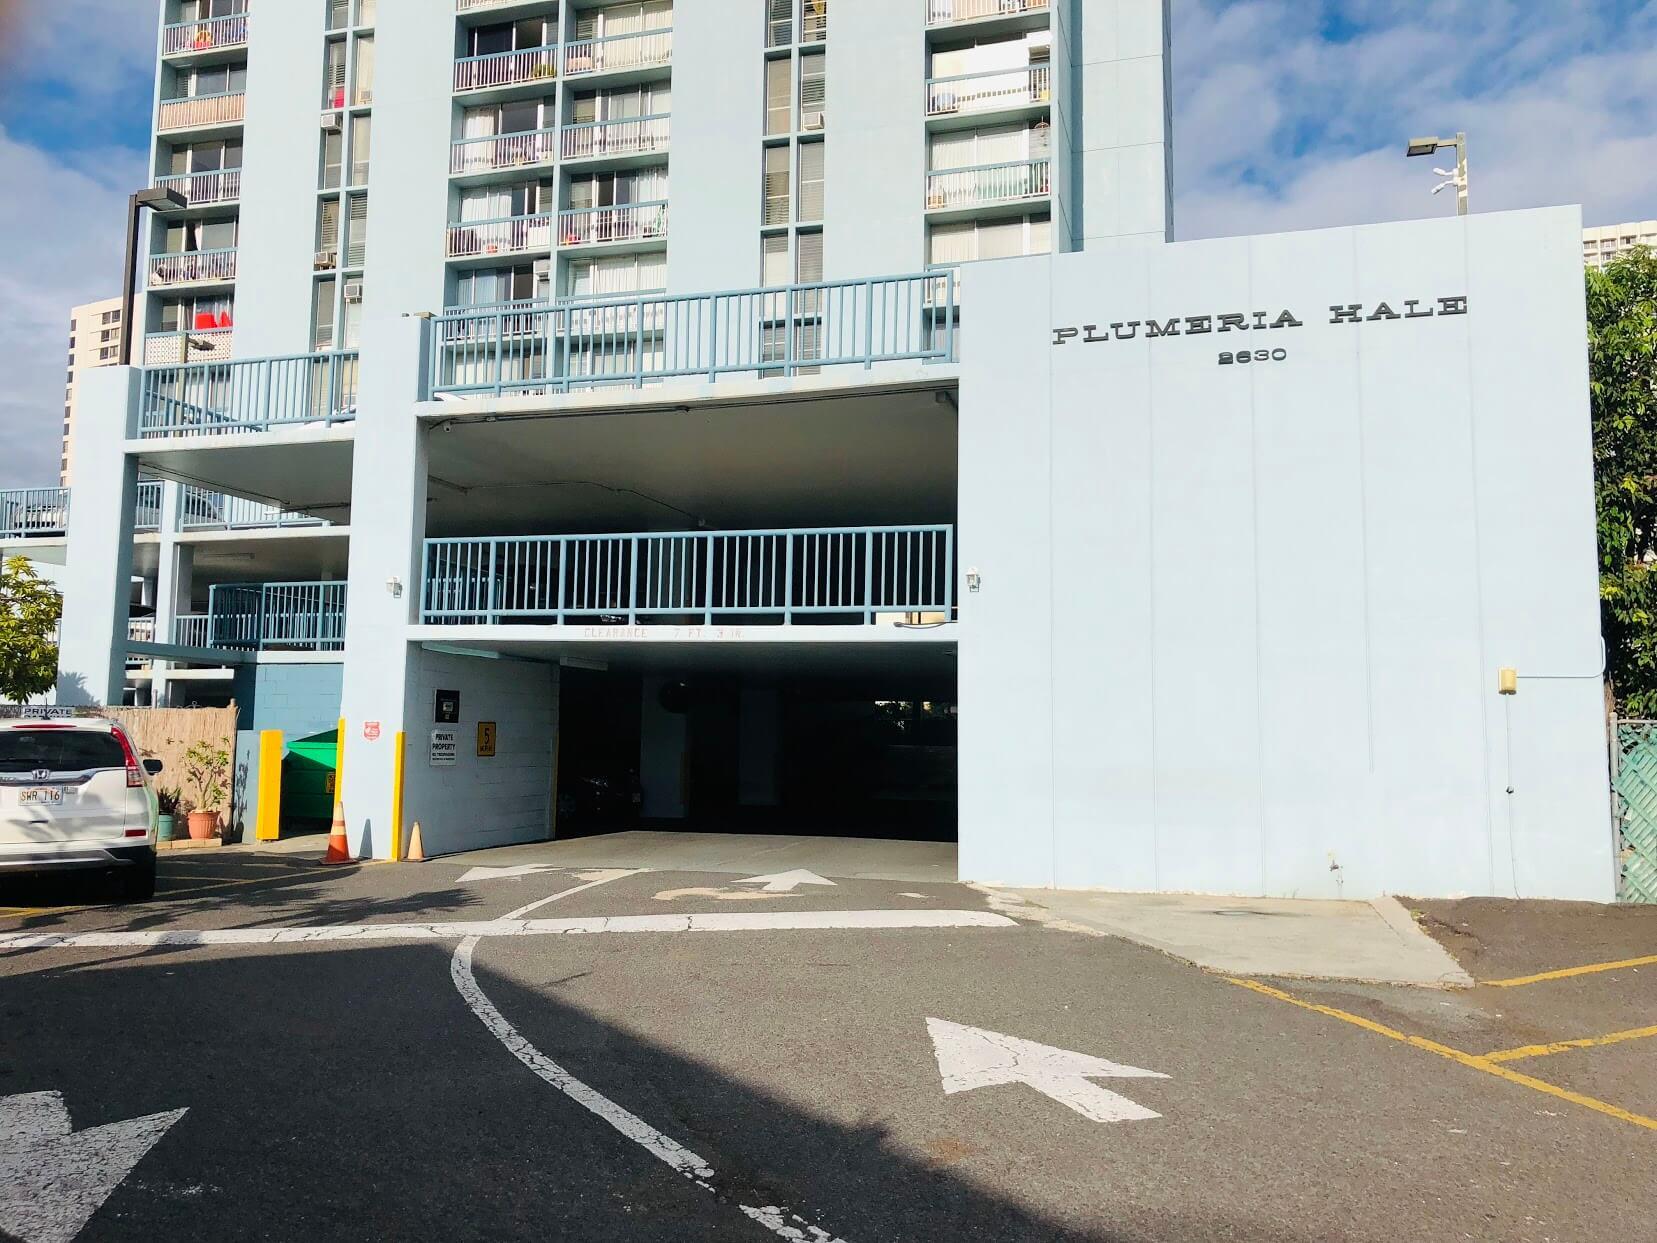 Plumeria Haleの駐車場